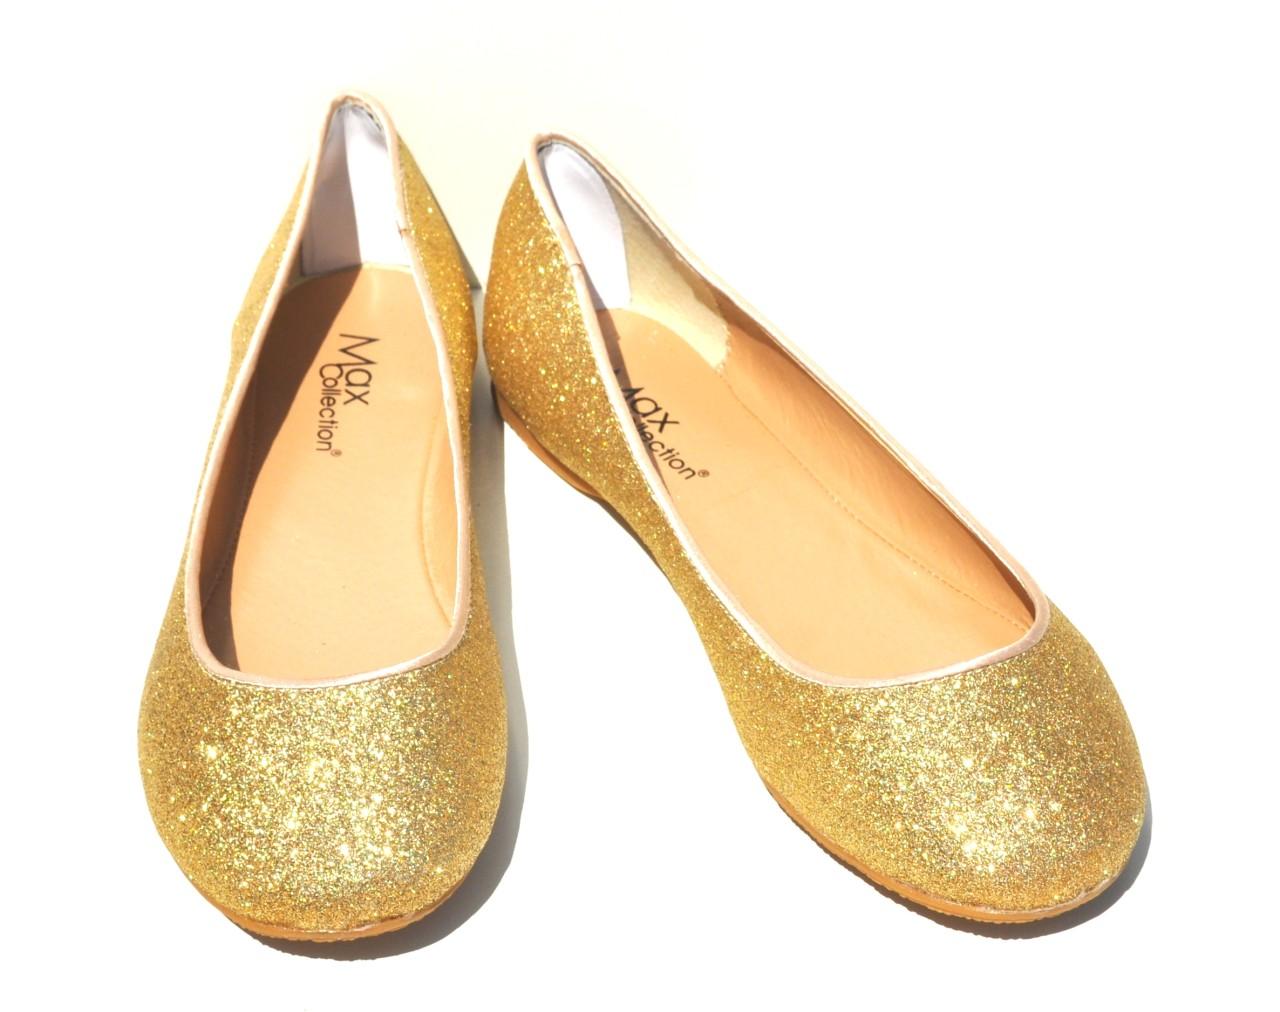 Gold Sandals Juli 2014